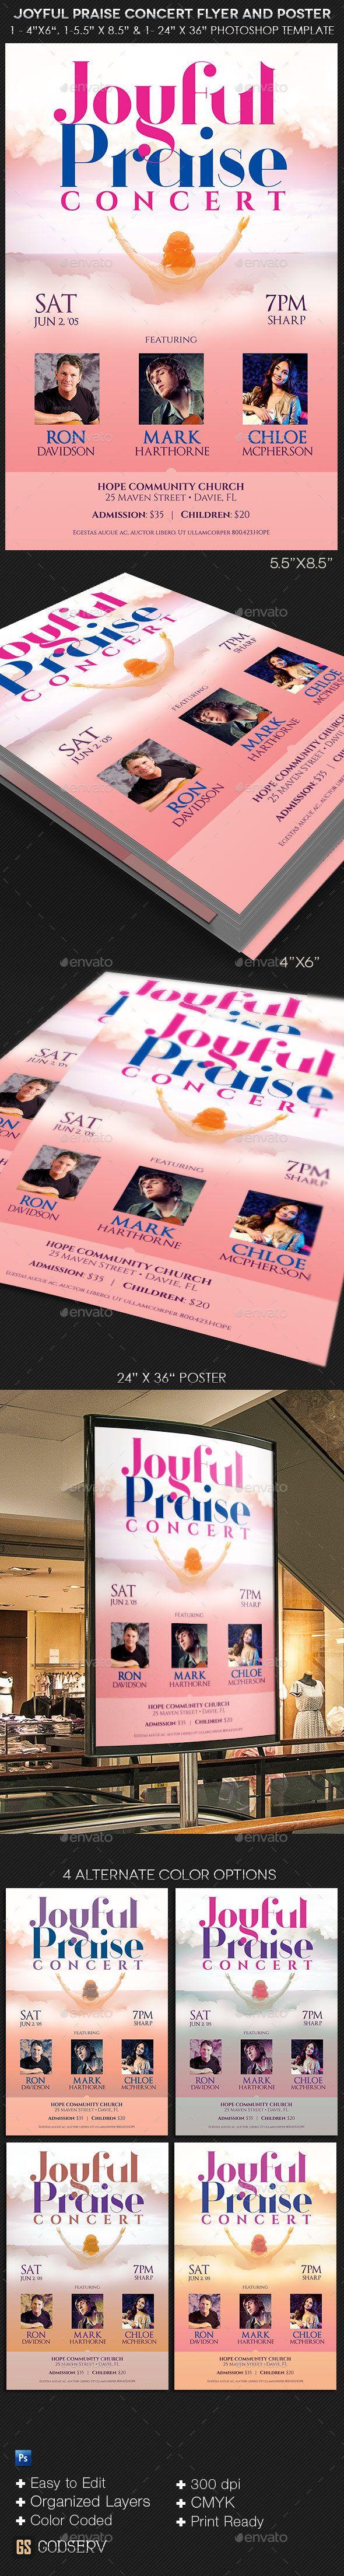 Joyful Praise Concert Flyer Poster Template  Concert Flyer